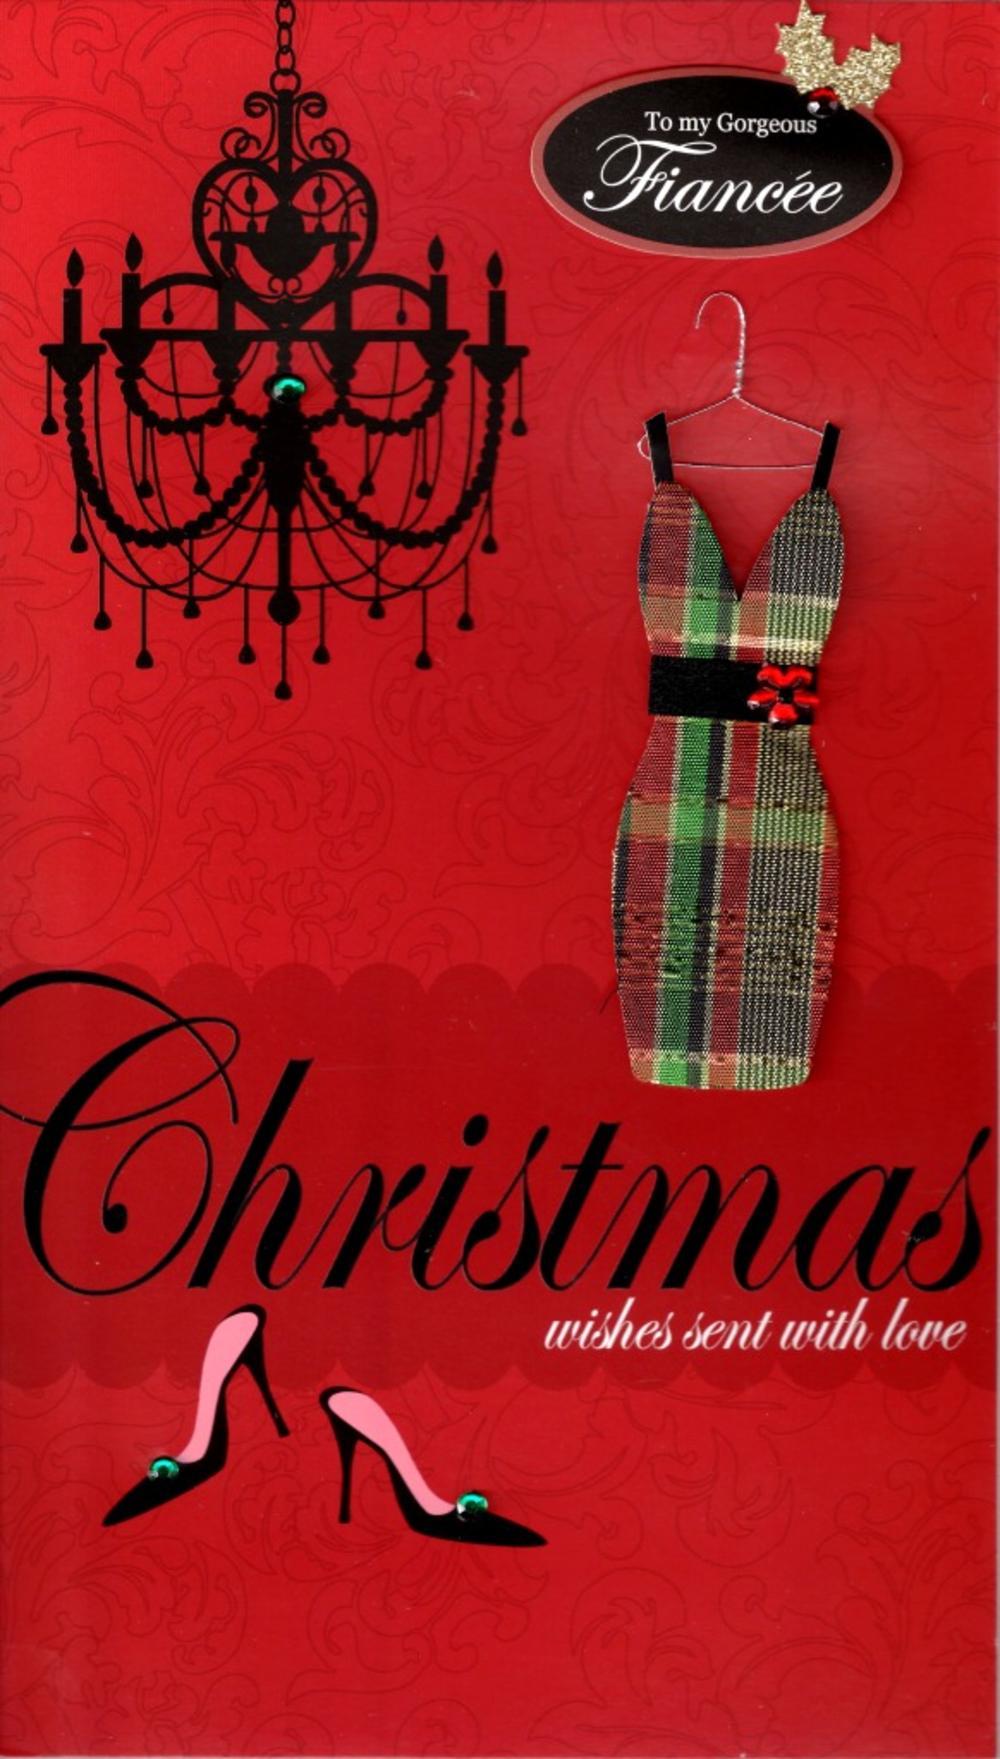 Fiancee Large Embellished Christmas Card Nice Message